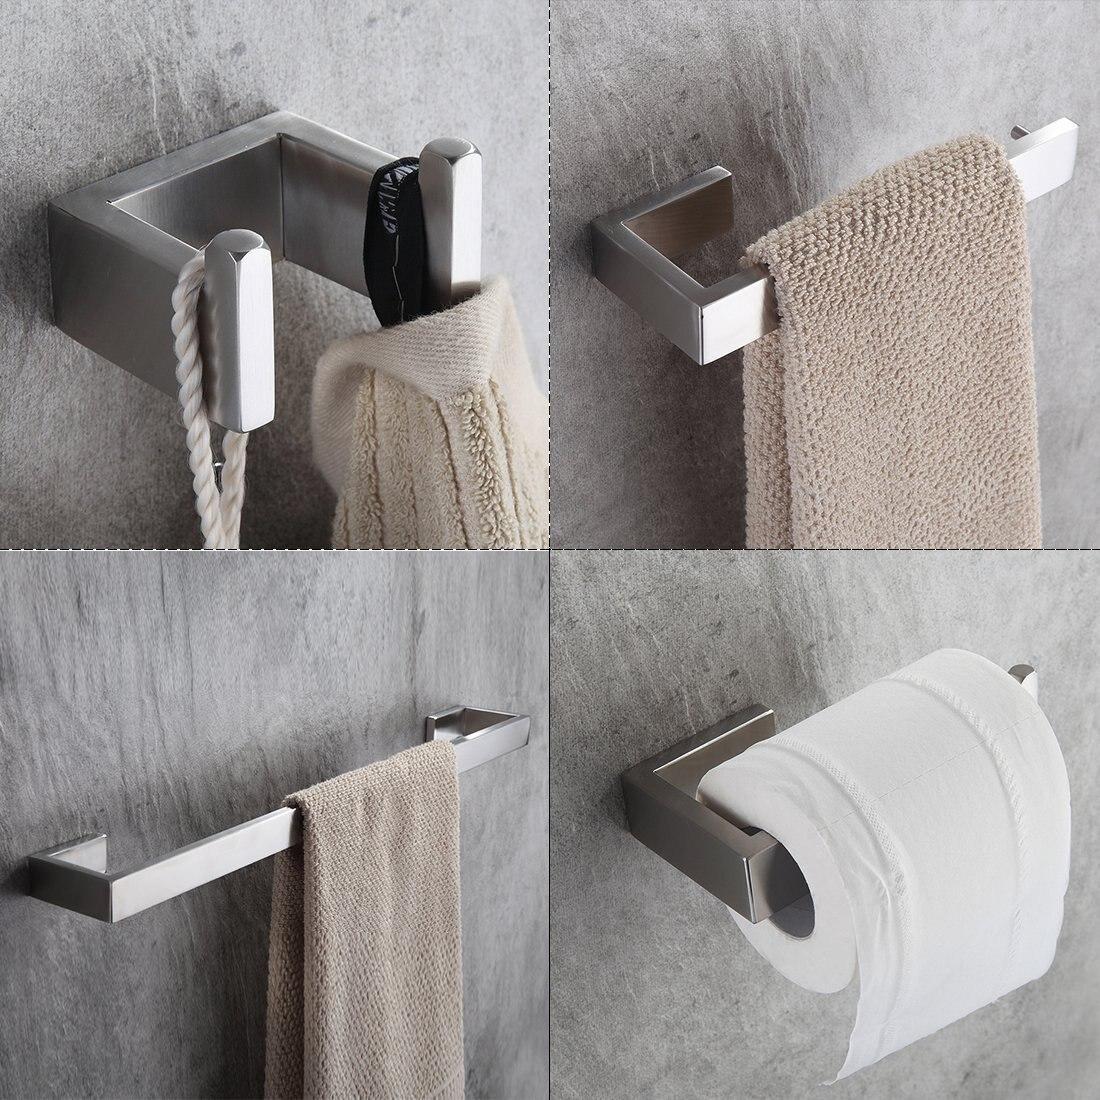 FLG 4 Piece set 304 Stainless Steel Bath Hardware Sets Bathroom Accessories Set Single Towel Bar